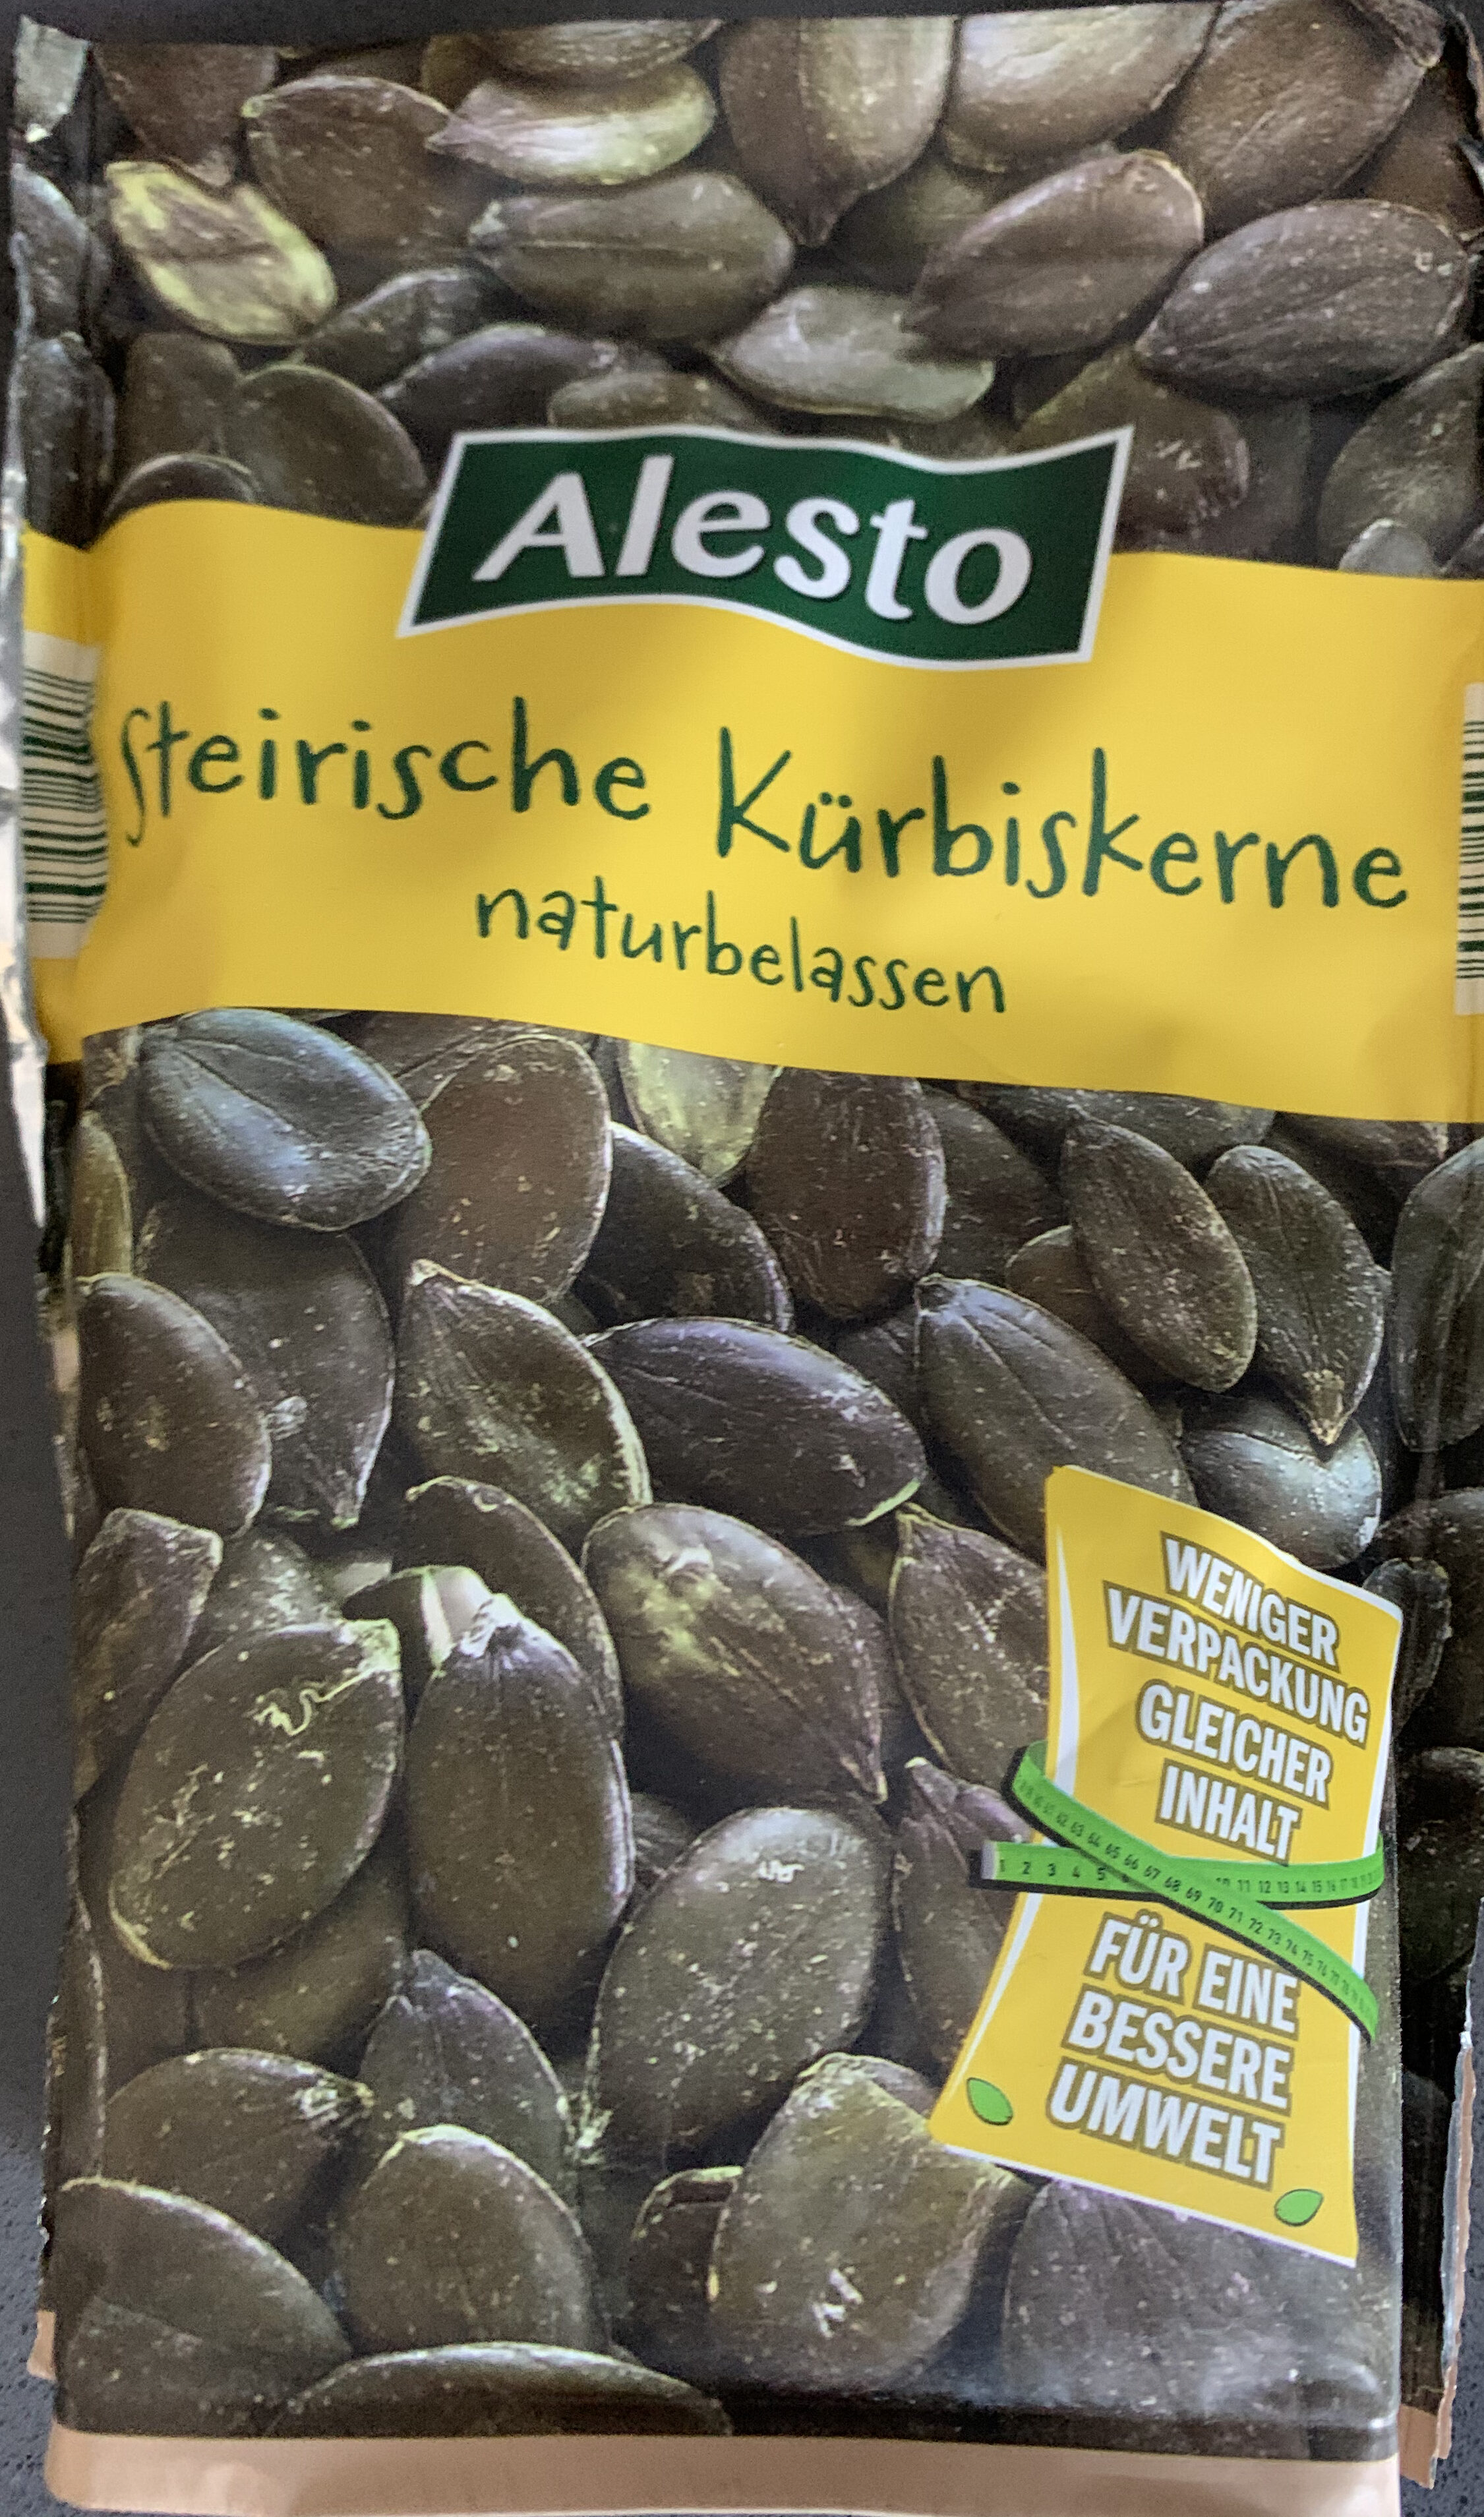 Steirische Kürbiskerne naturbelassen - Prodotto - de